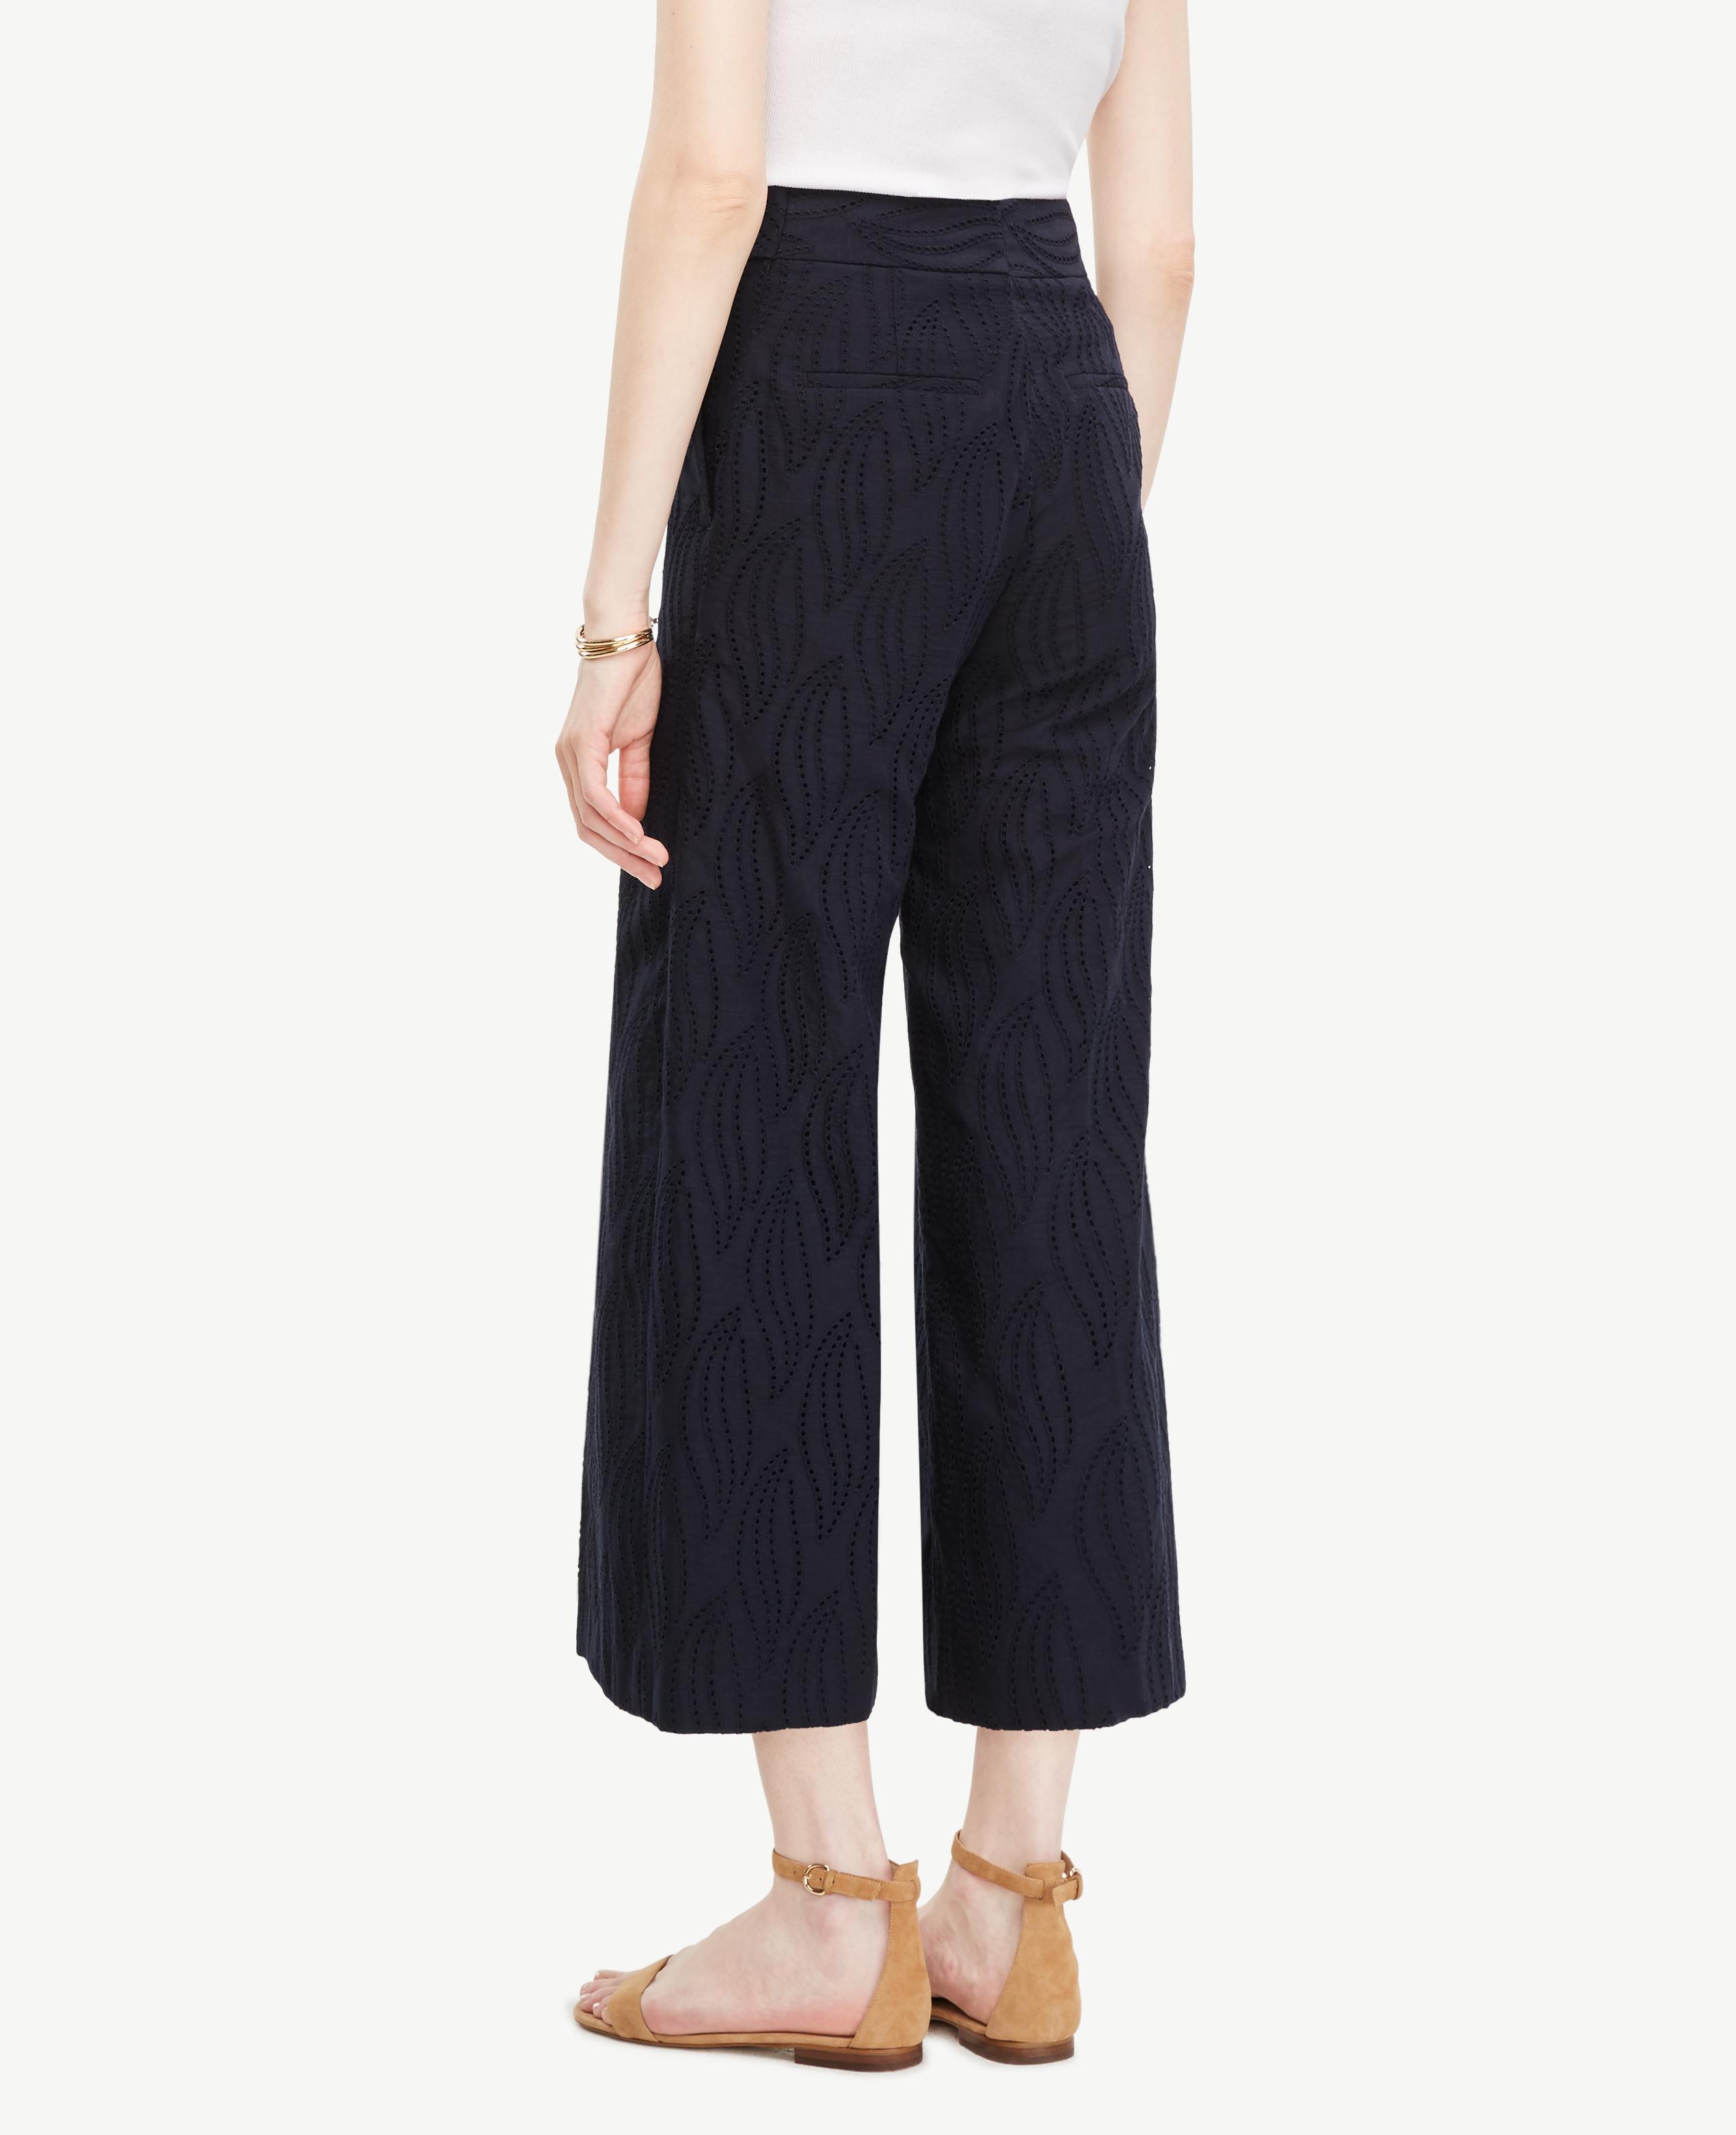 Ann taylor the swirl eyelet wide leg marina pant in blue for Ann taylor loft fashion island